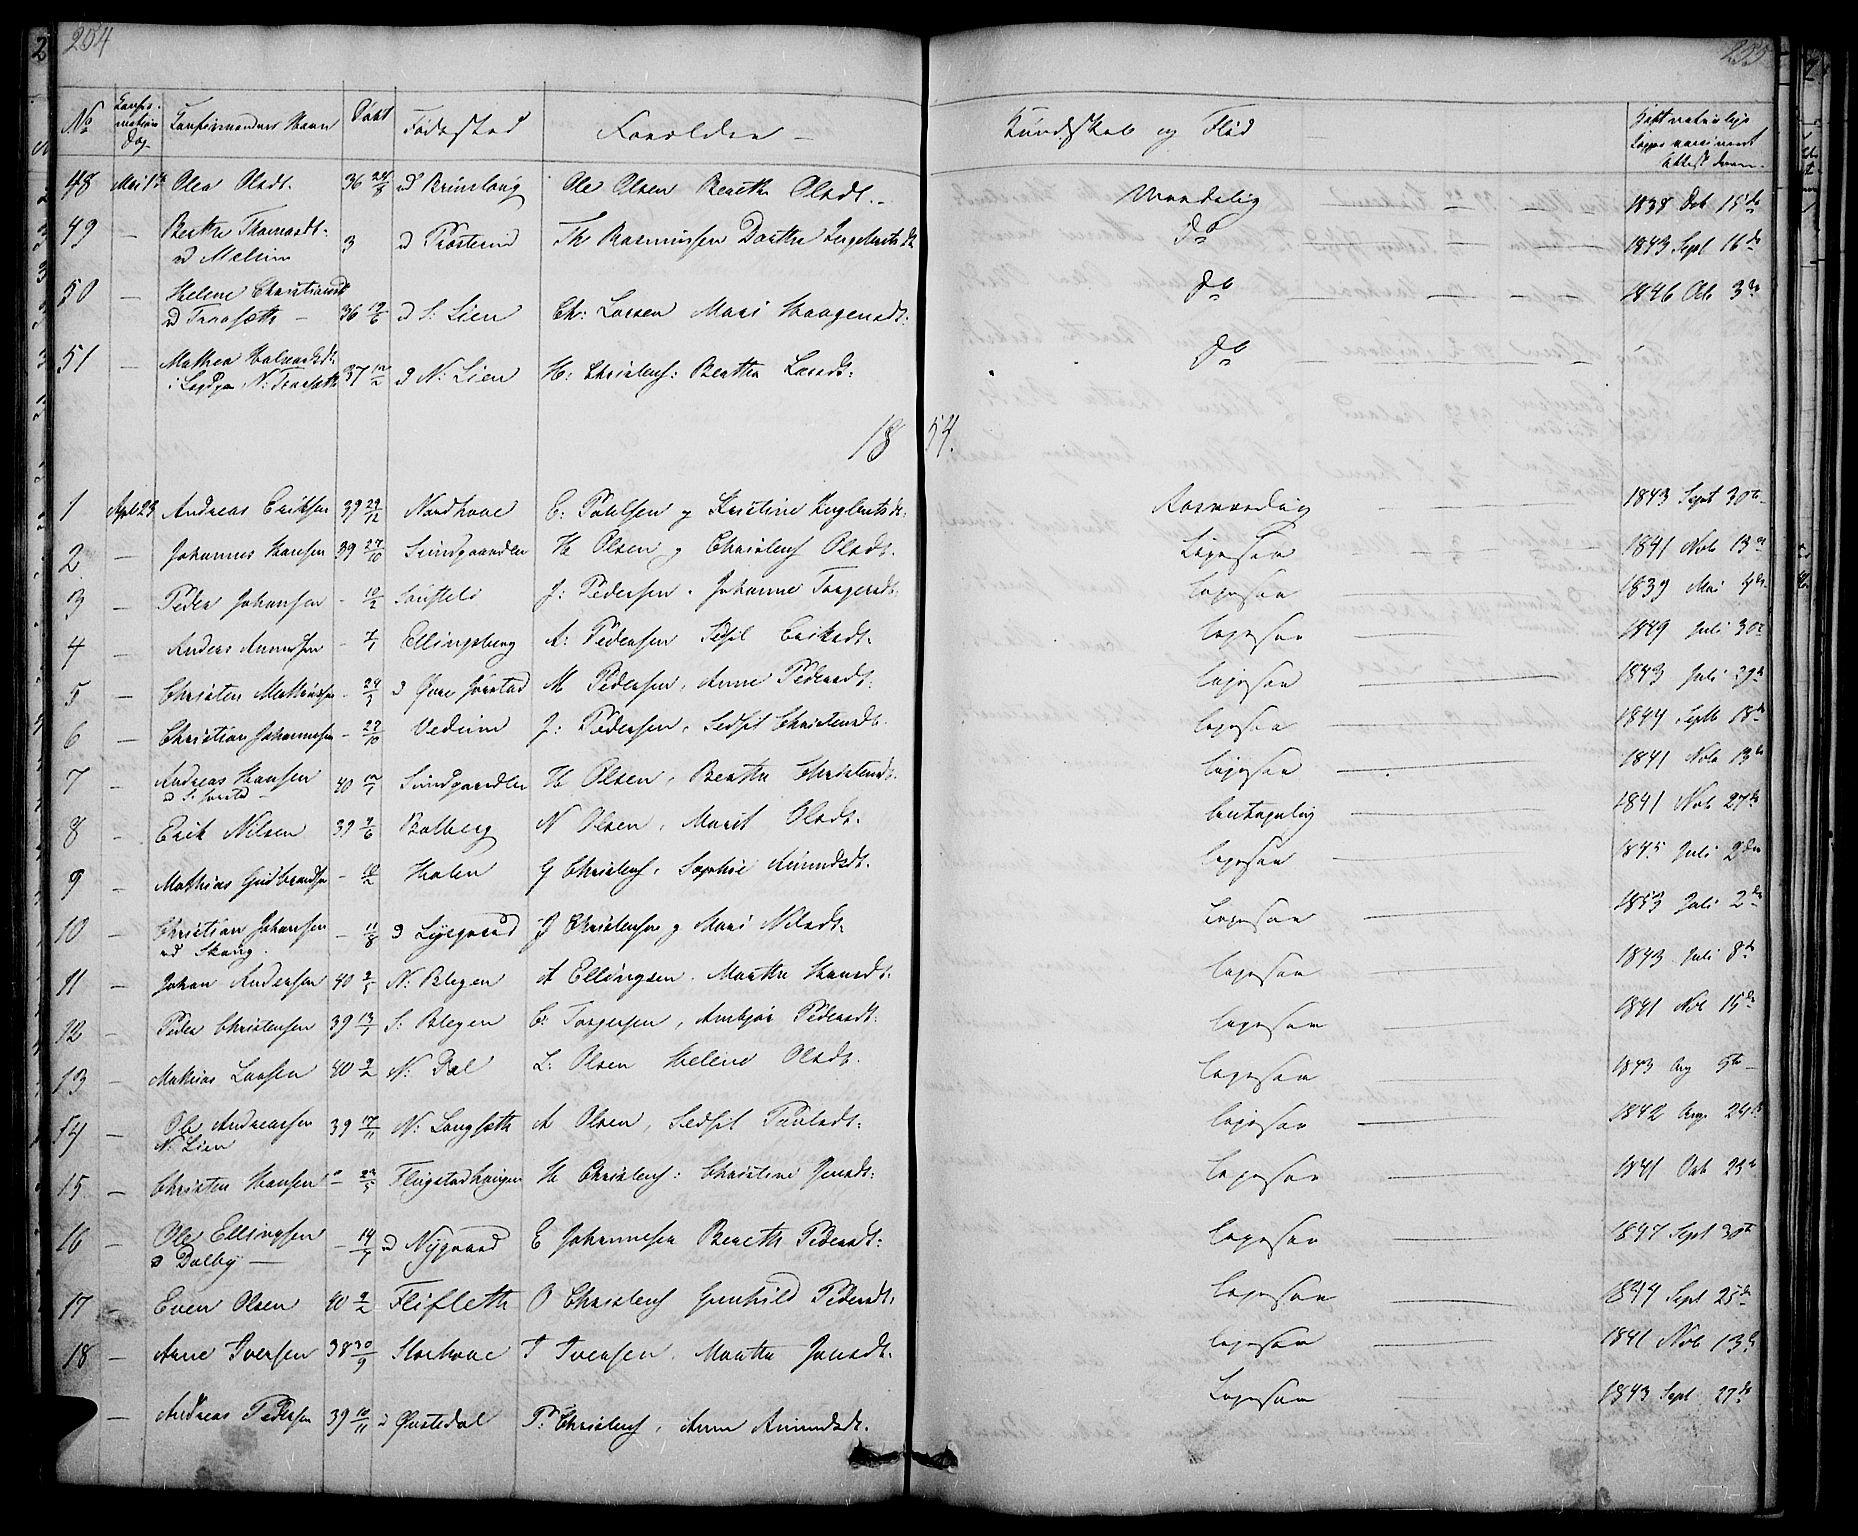 SAH, Fåberg prestekontor, Klokkerbok nr. 5, 1837-1864, s. 254-255